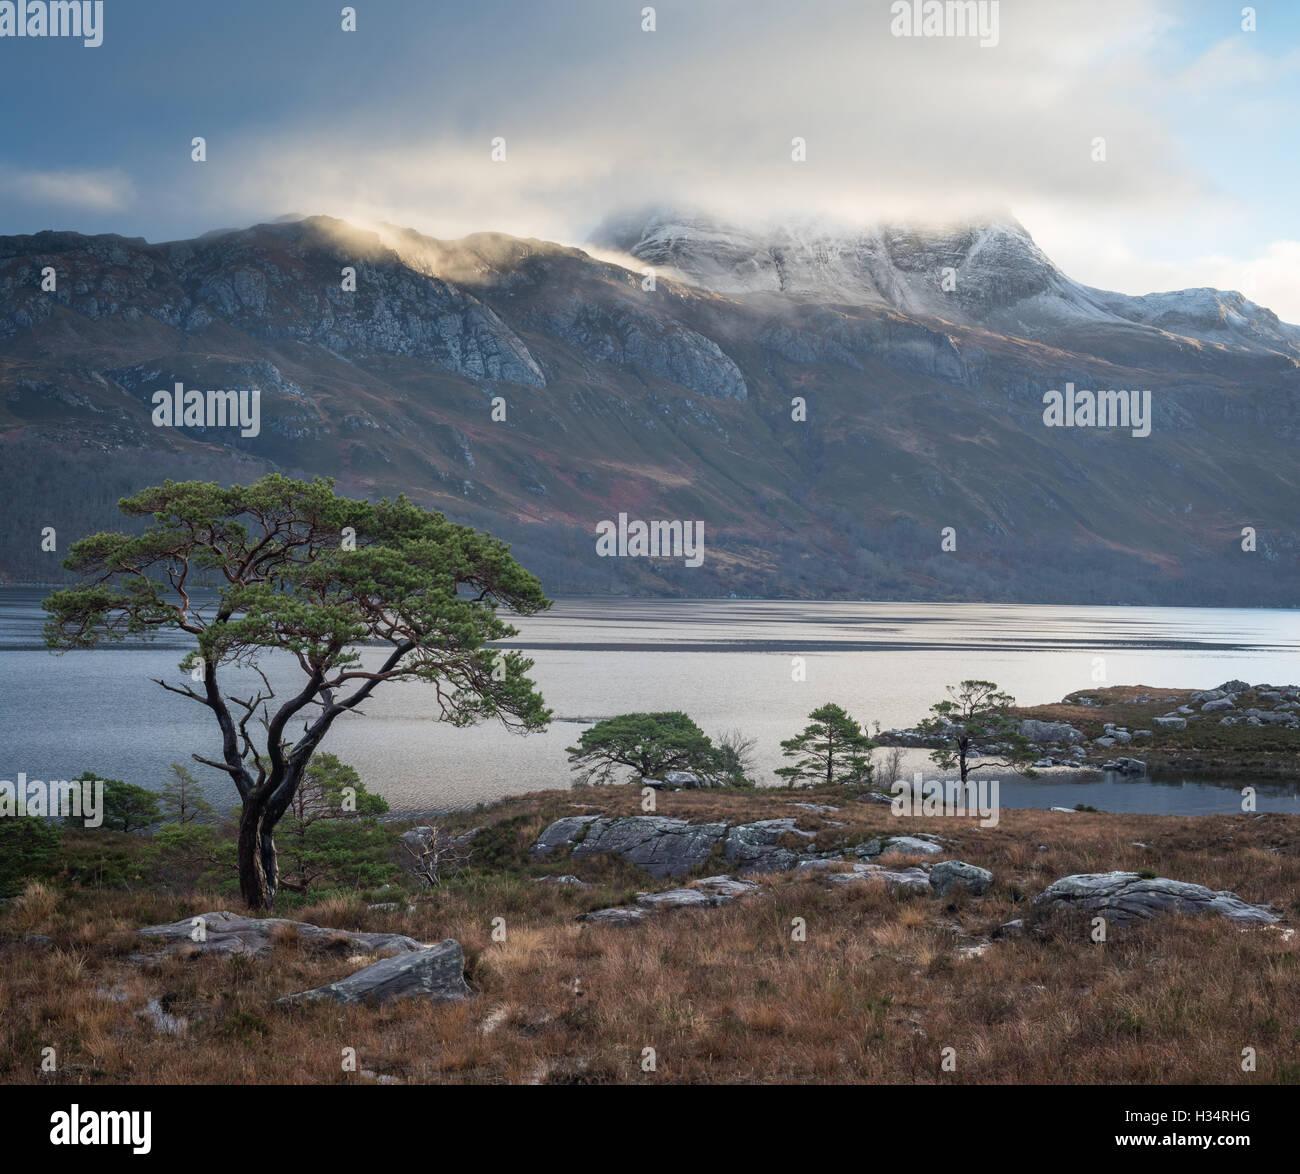 Loch Maree and Slioch, Scottish Highlands, Scotland - Stock Image